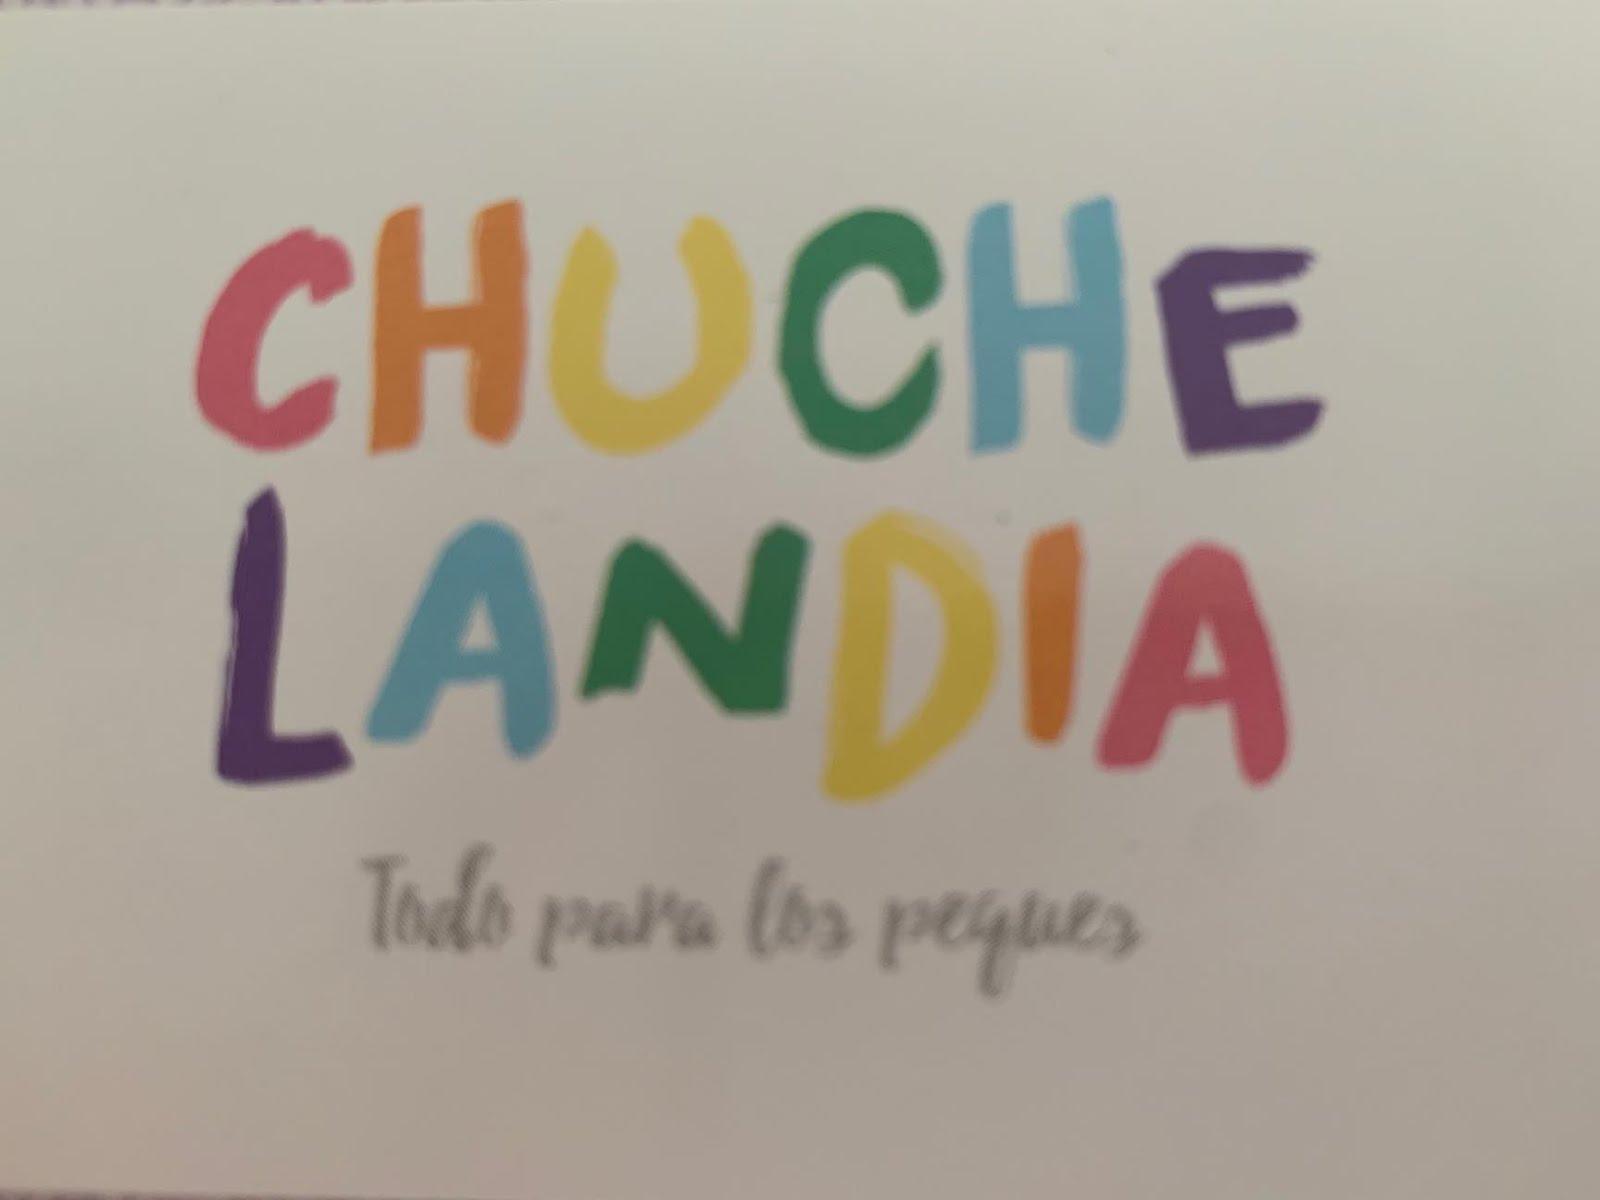 Chuchelandia peques